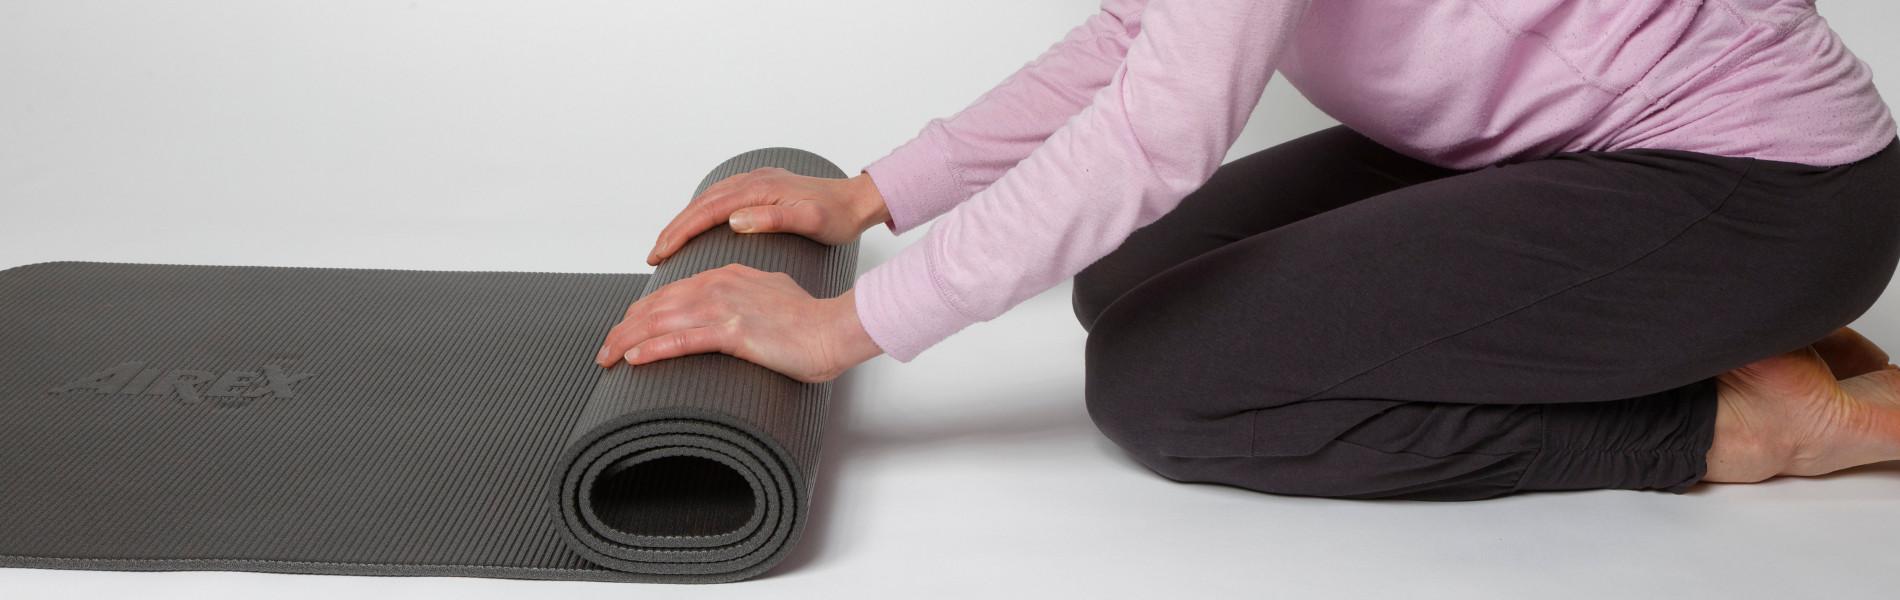 slider_daniela_weissenborn_yoga-matte